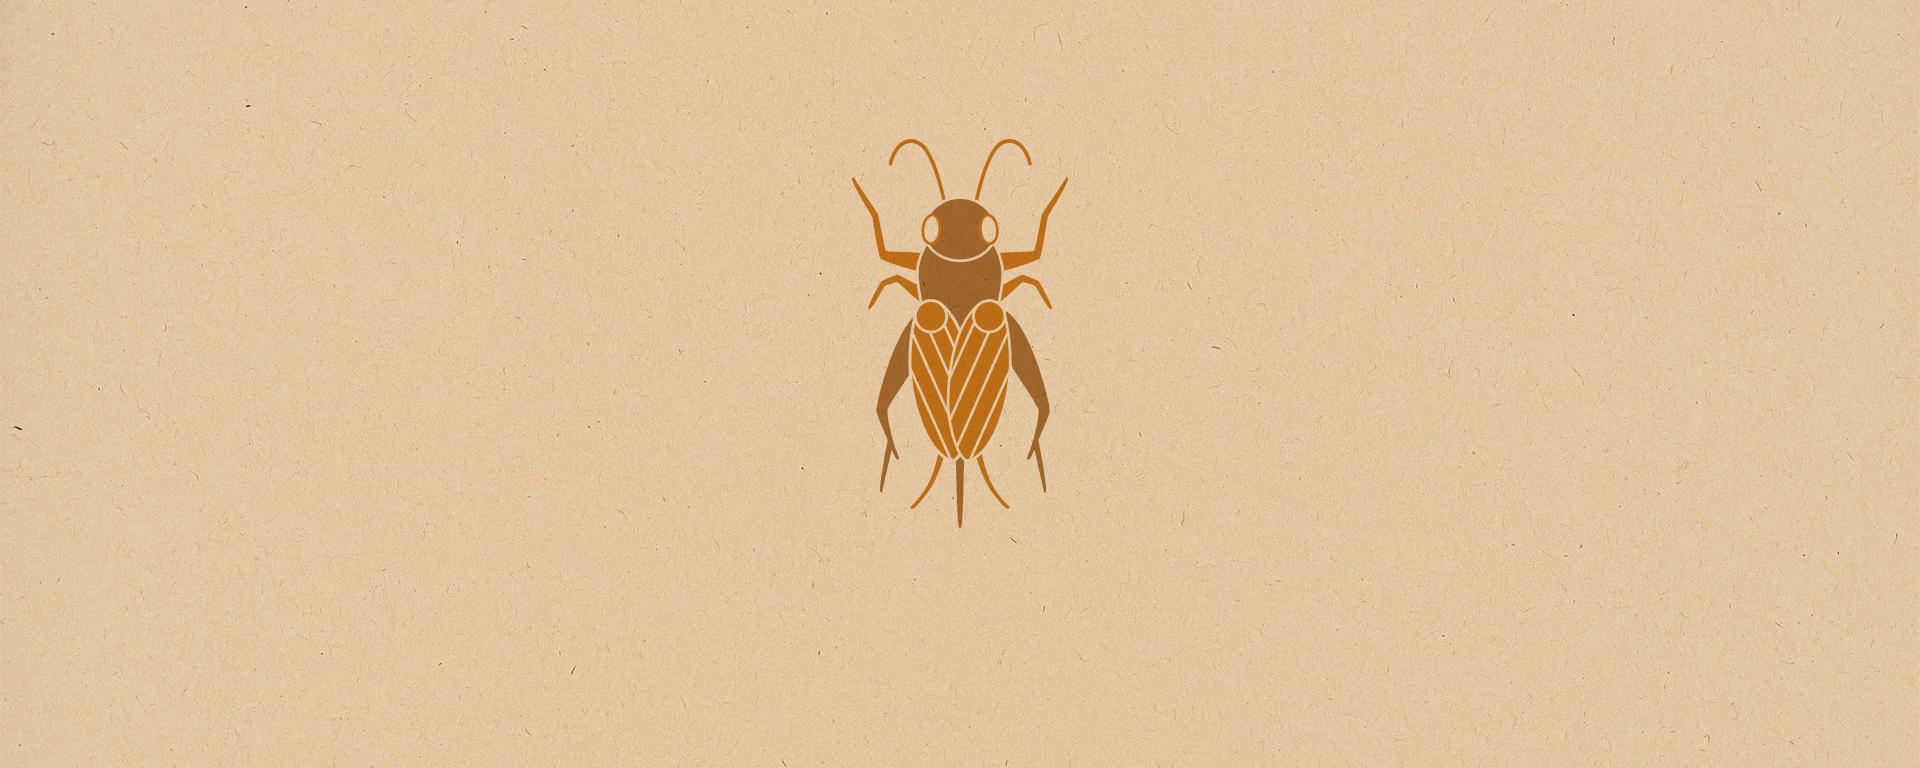 Photo of 日本無印良品推出「蟋蟀仙貝」!吃昆蟲食拯救地球?!你敢嘗試嗎?